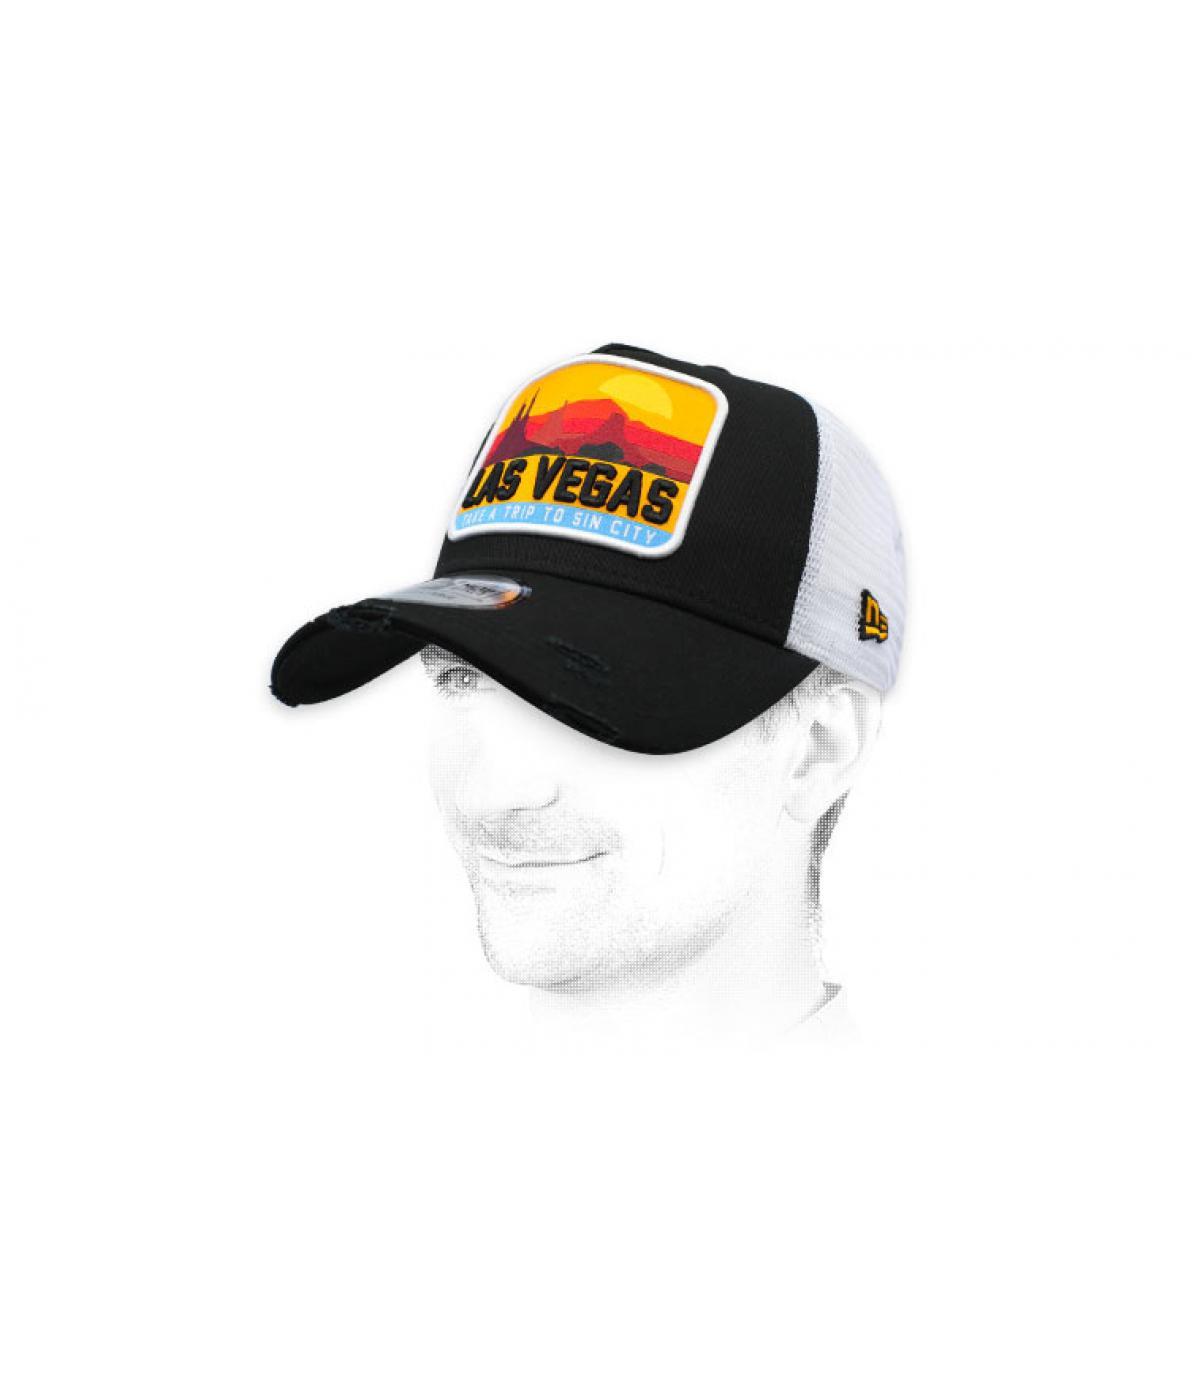 New Era Las Vegas trucker